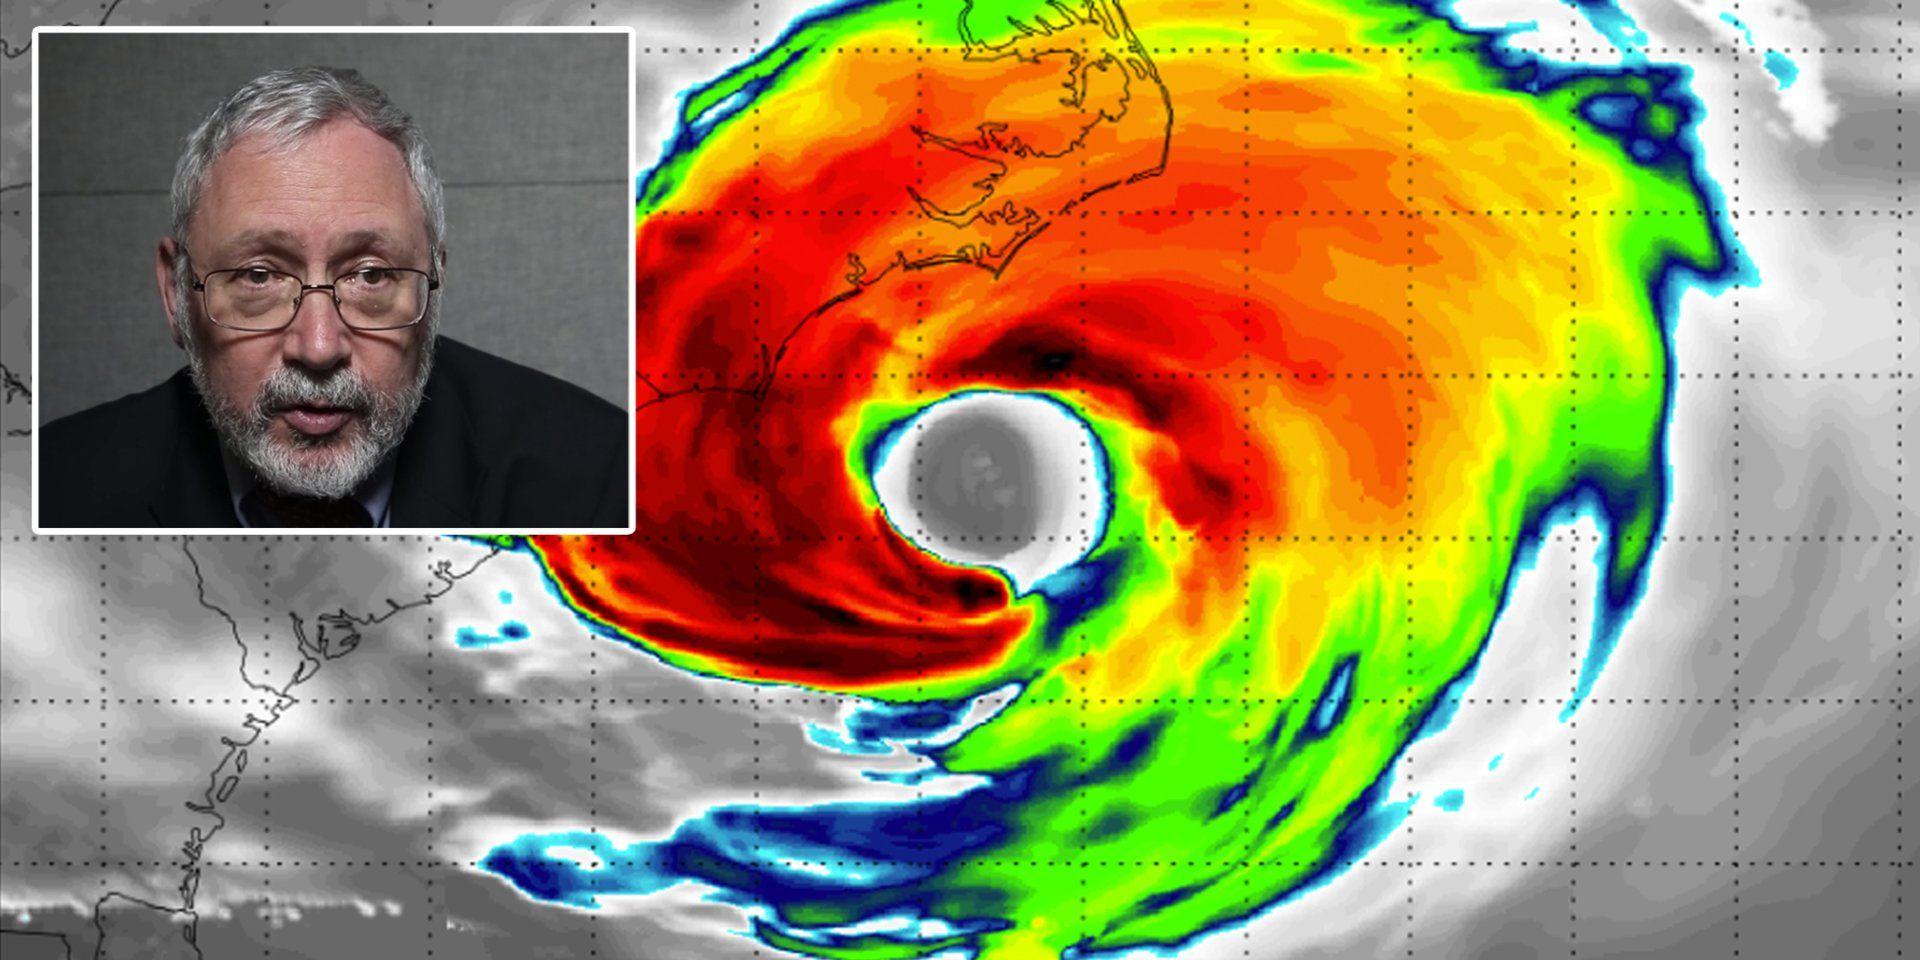 Hurricane Florence Katrina Reporter S Warning For Any Who Don T Flee Hurricane Katrina Hurricane Katrina